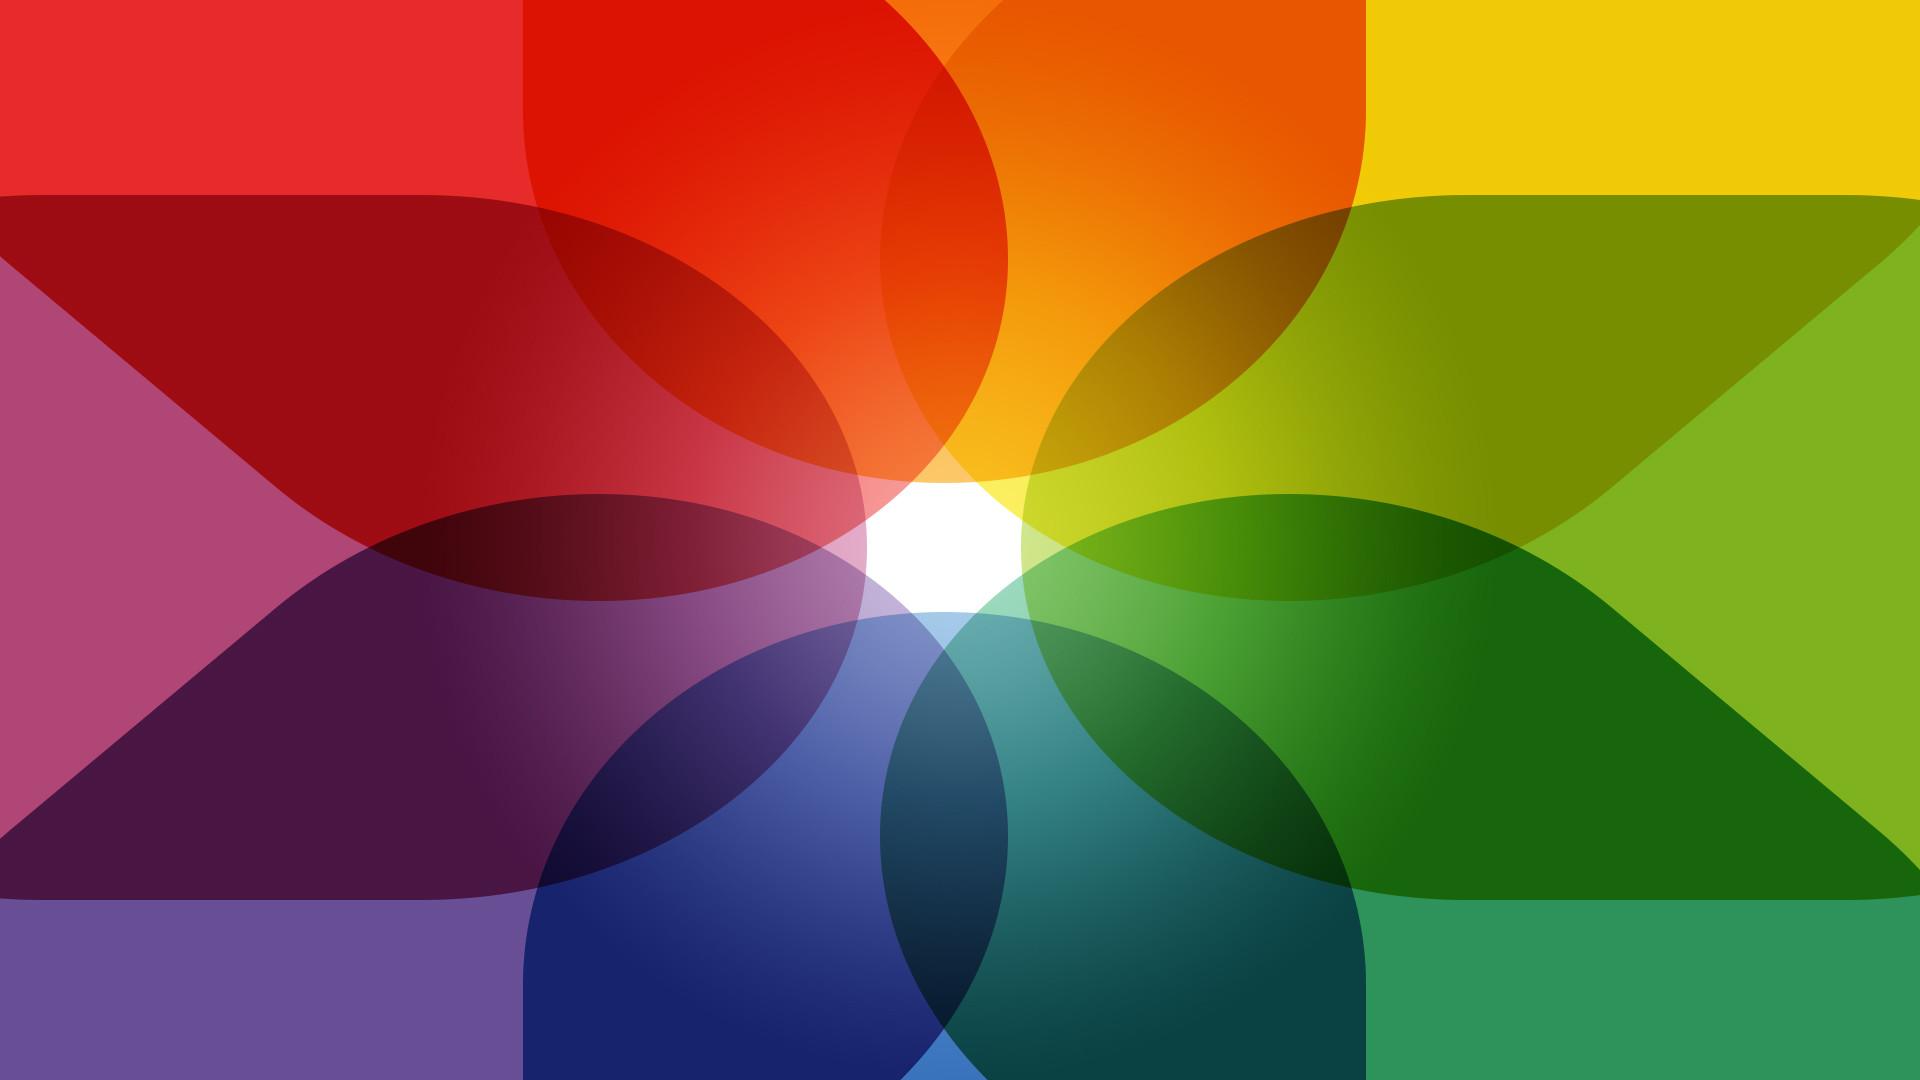 Ios 8 Infinity Symbol Wallpaper 2016 Ios 8 Infinity Symbol Wallpaper